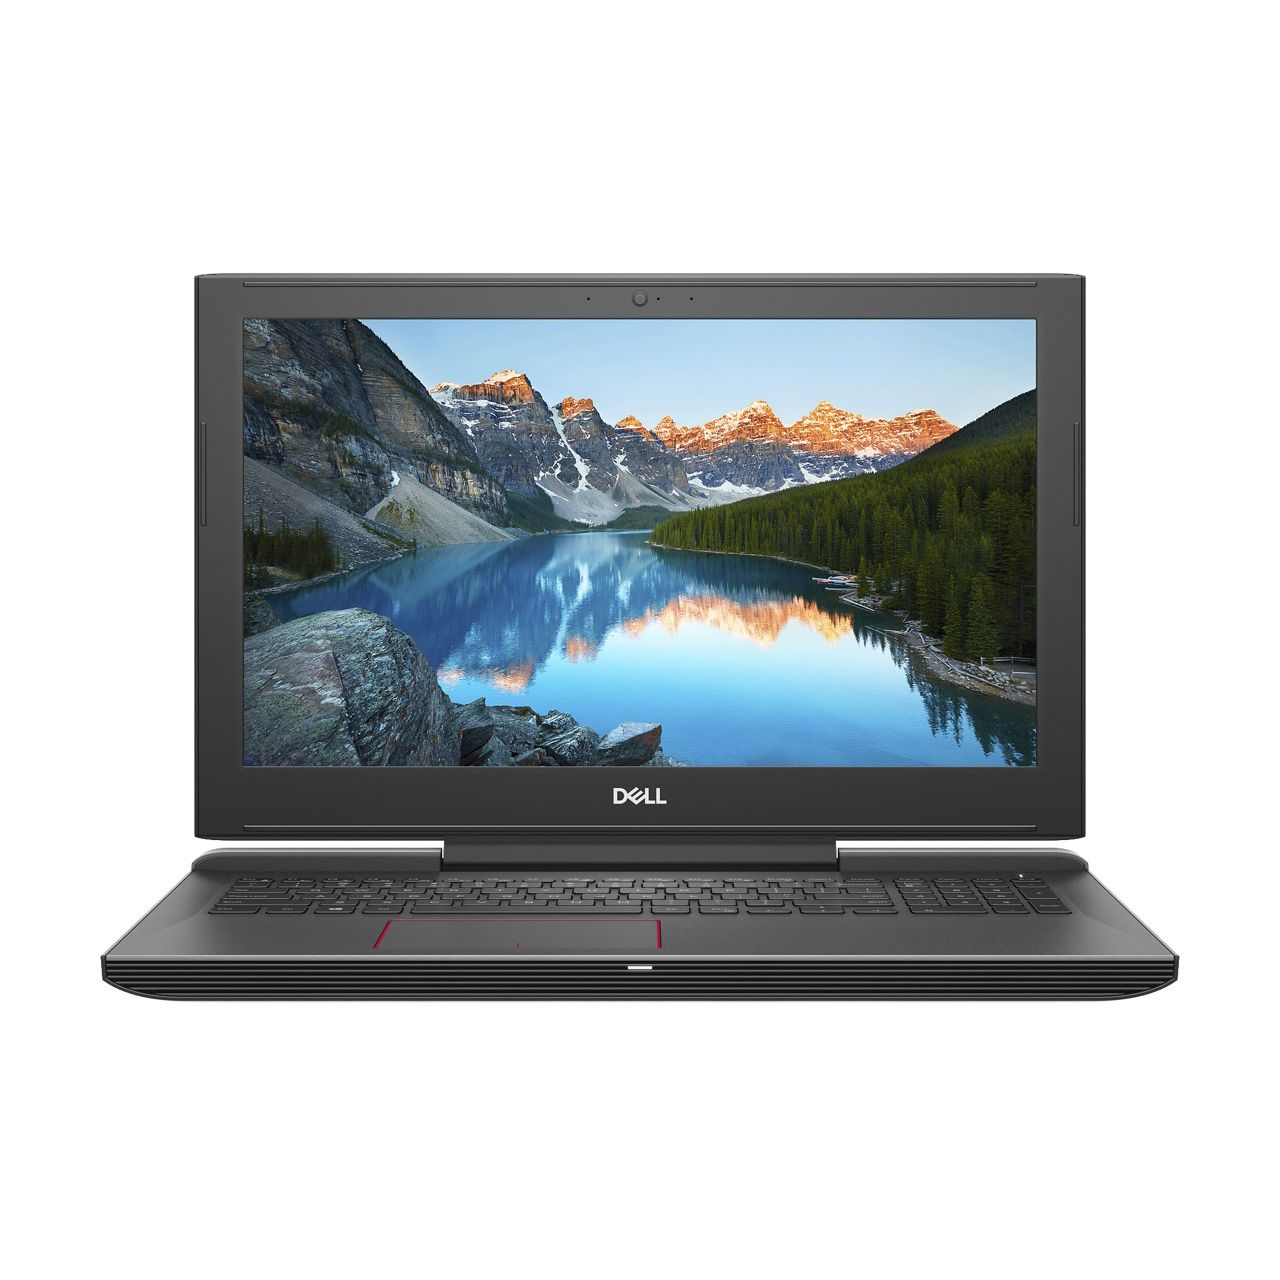 Notebook Dell Inspiron 7577 15.6 Full HD Intel Core i5-7300HQ GTX 1060-6GB RAM 8GB SSD 256GB Windows 10 Home